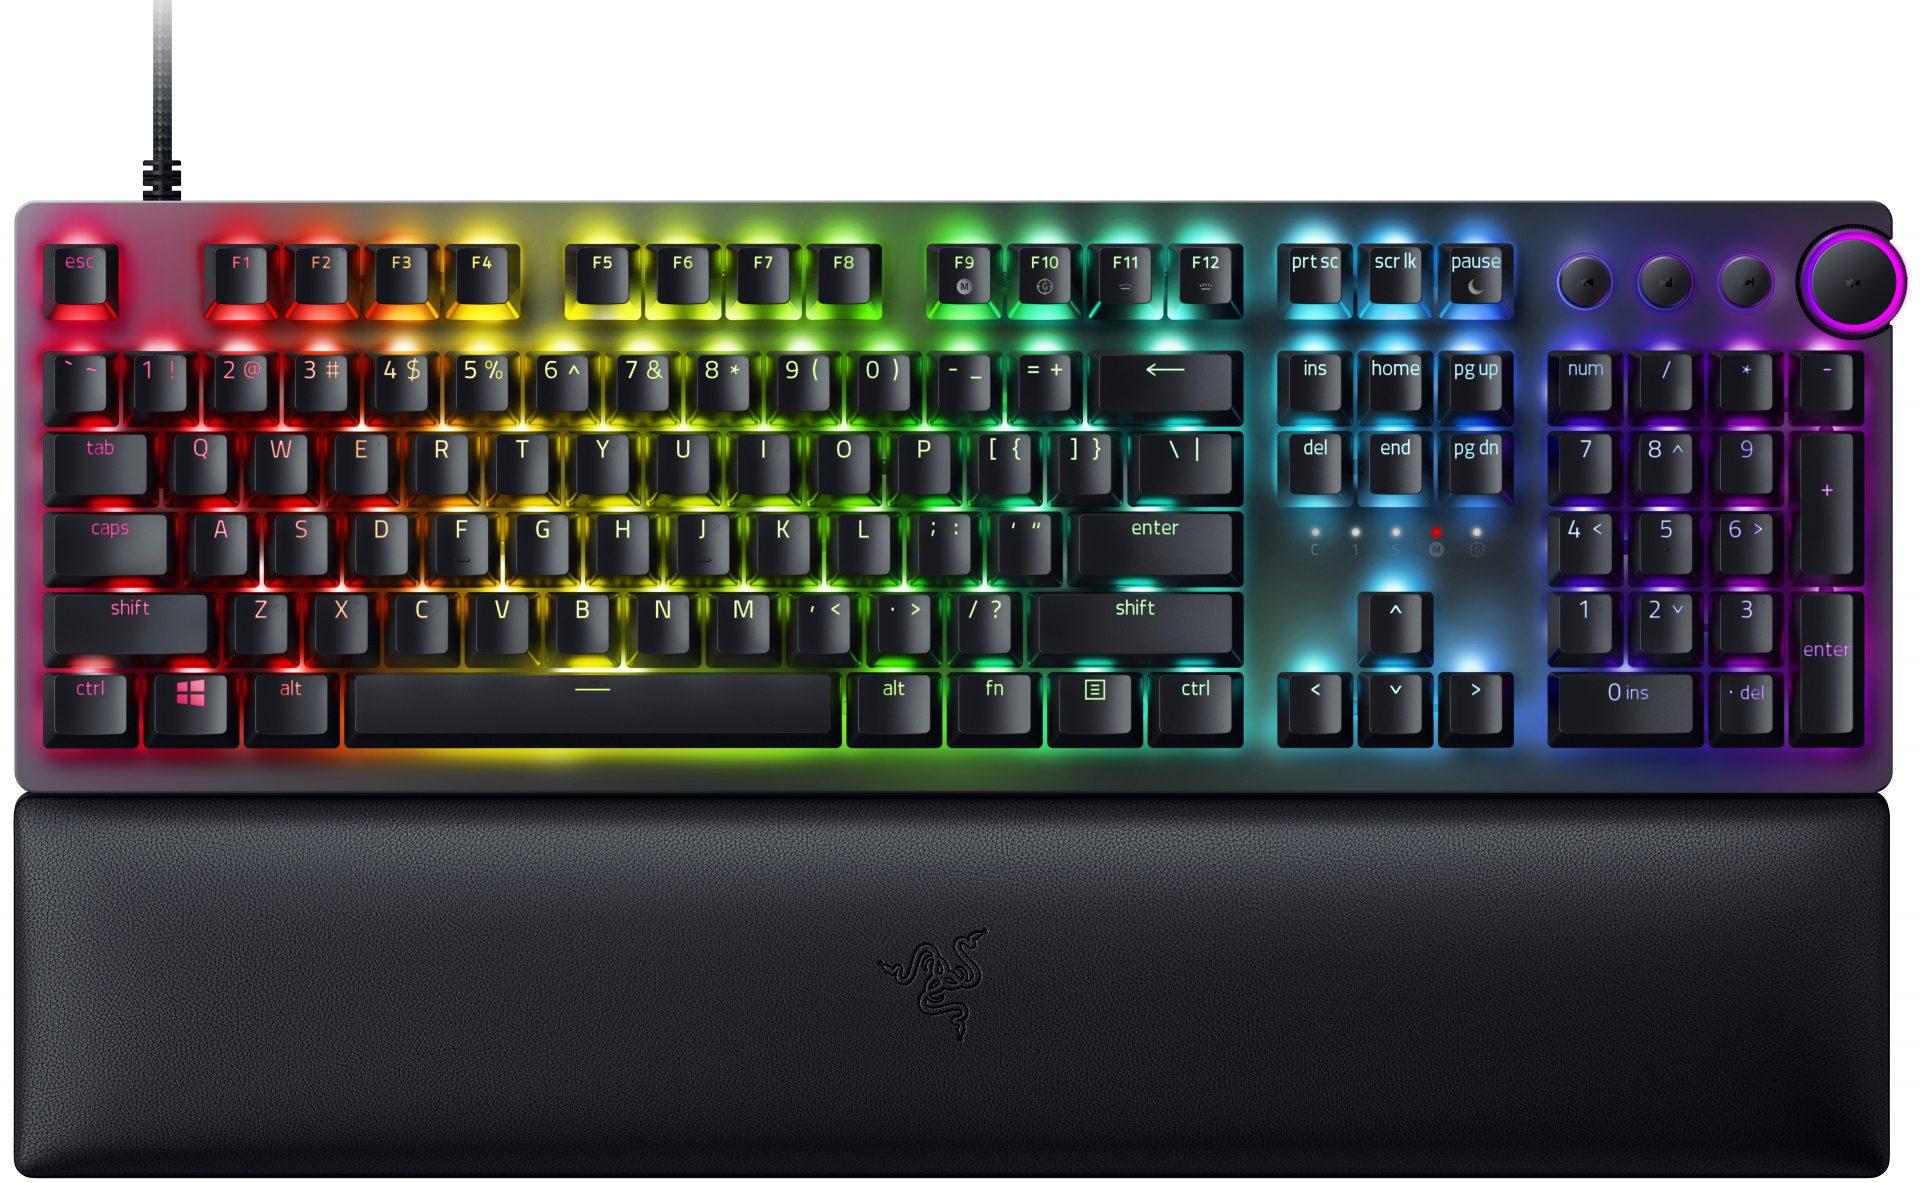 Razer HUNTSMAN V2 - RGB Optical Gaming Keyboard (Clicky Purple Switch) - US Layout - Razer 1.28.80.11.111